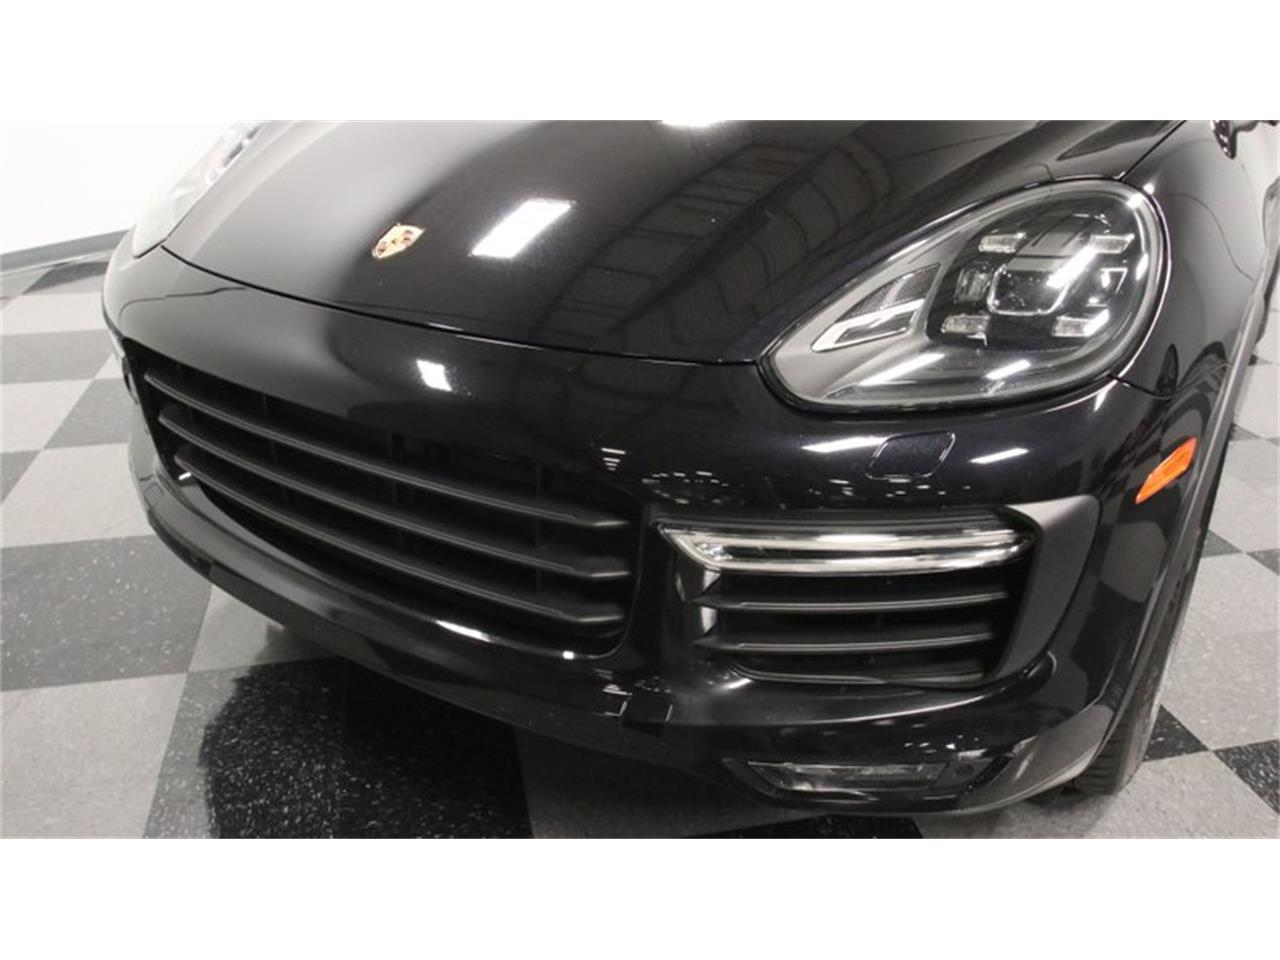 2016 Porsche Cayenne (CC-1295614) for sale in Lithia Springs, Georgia